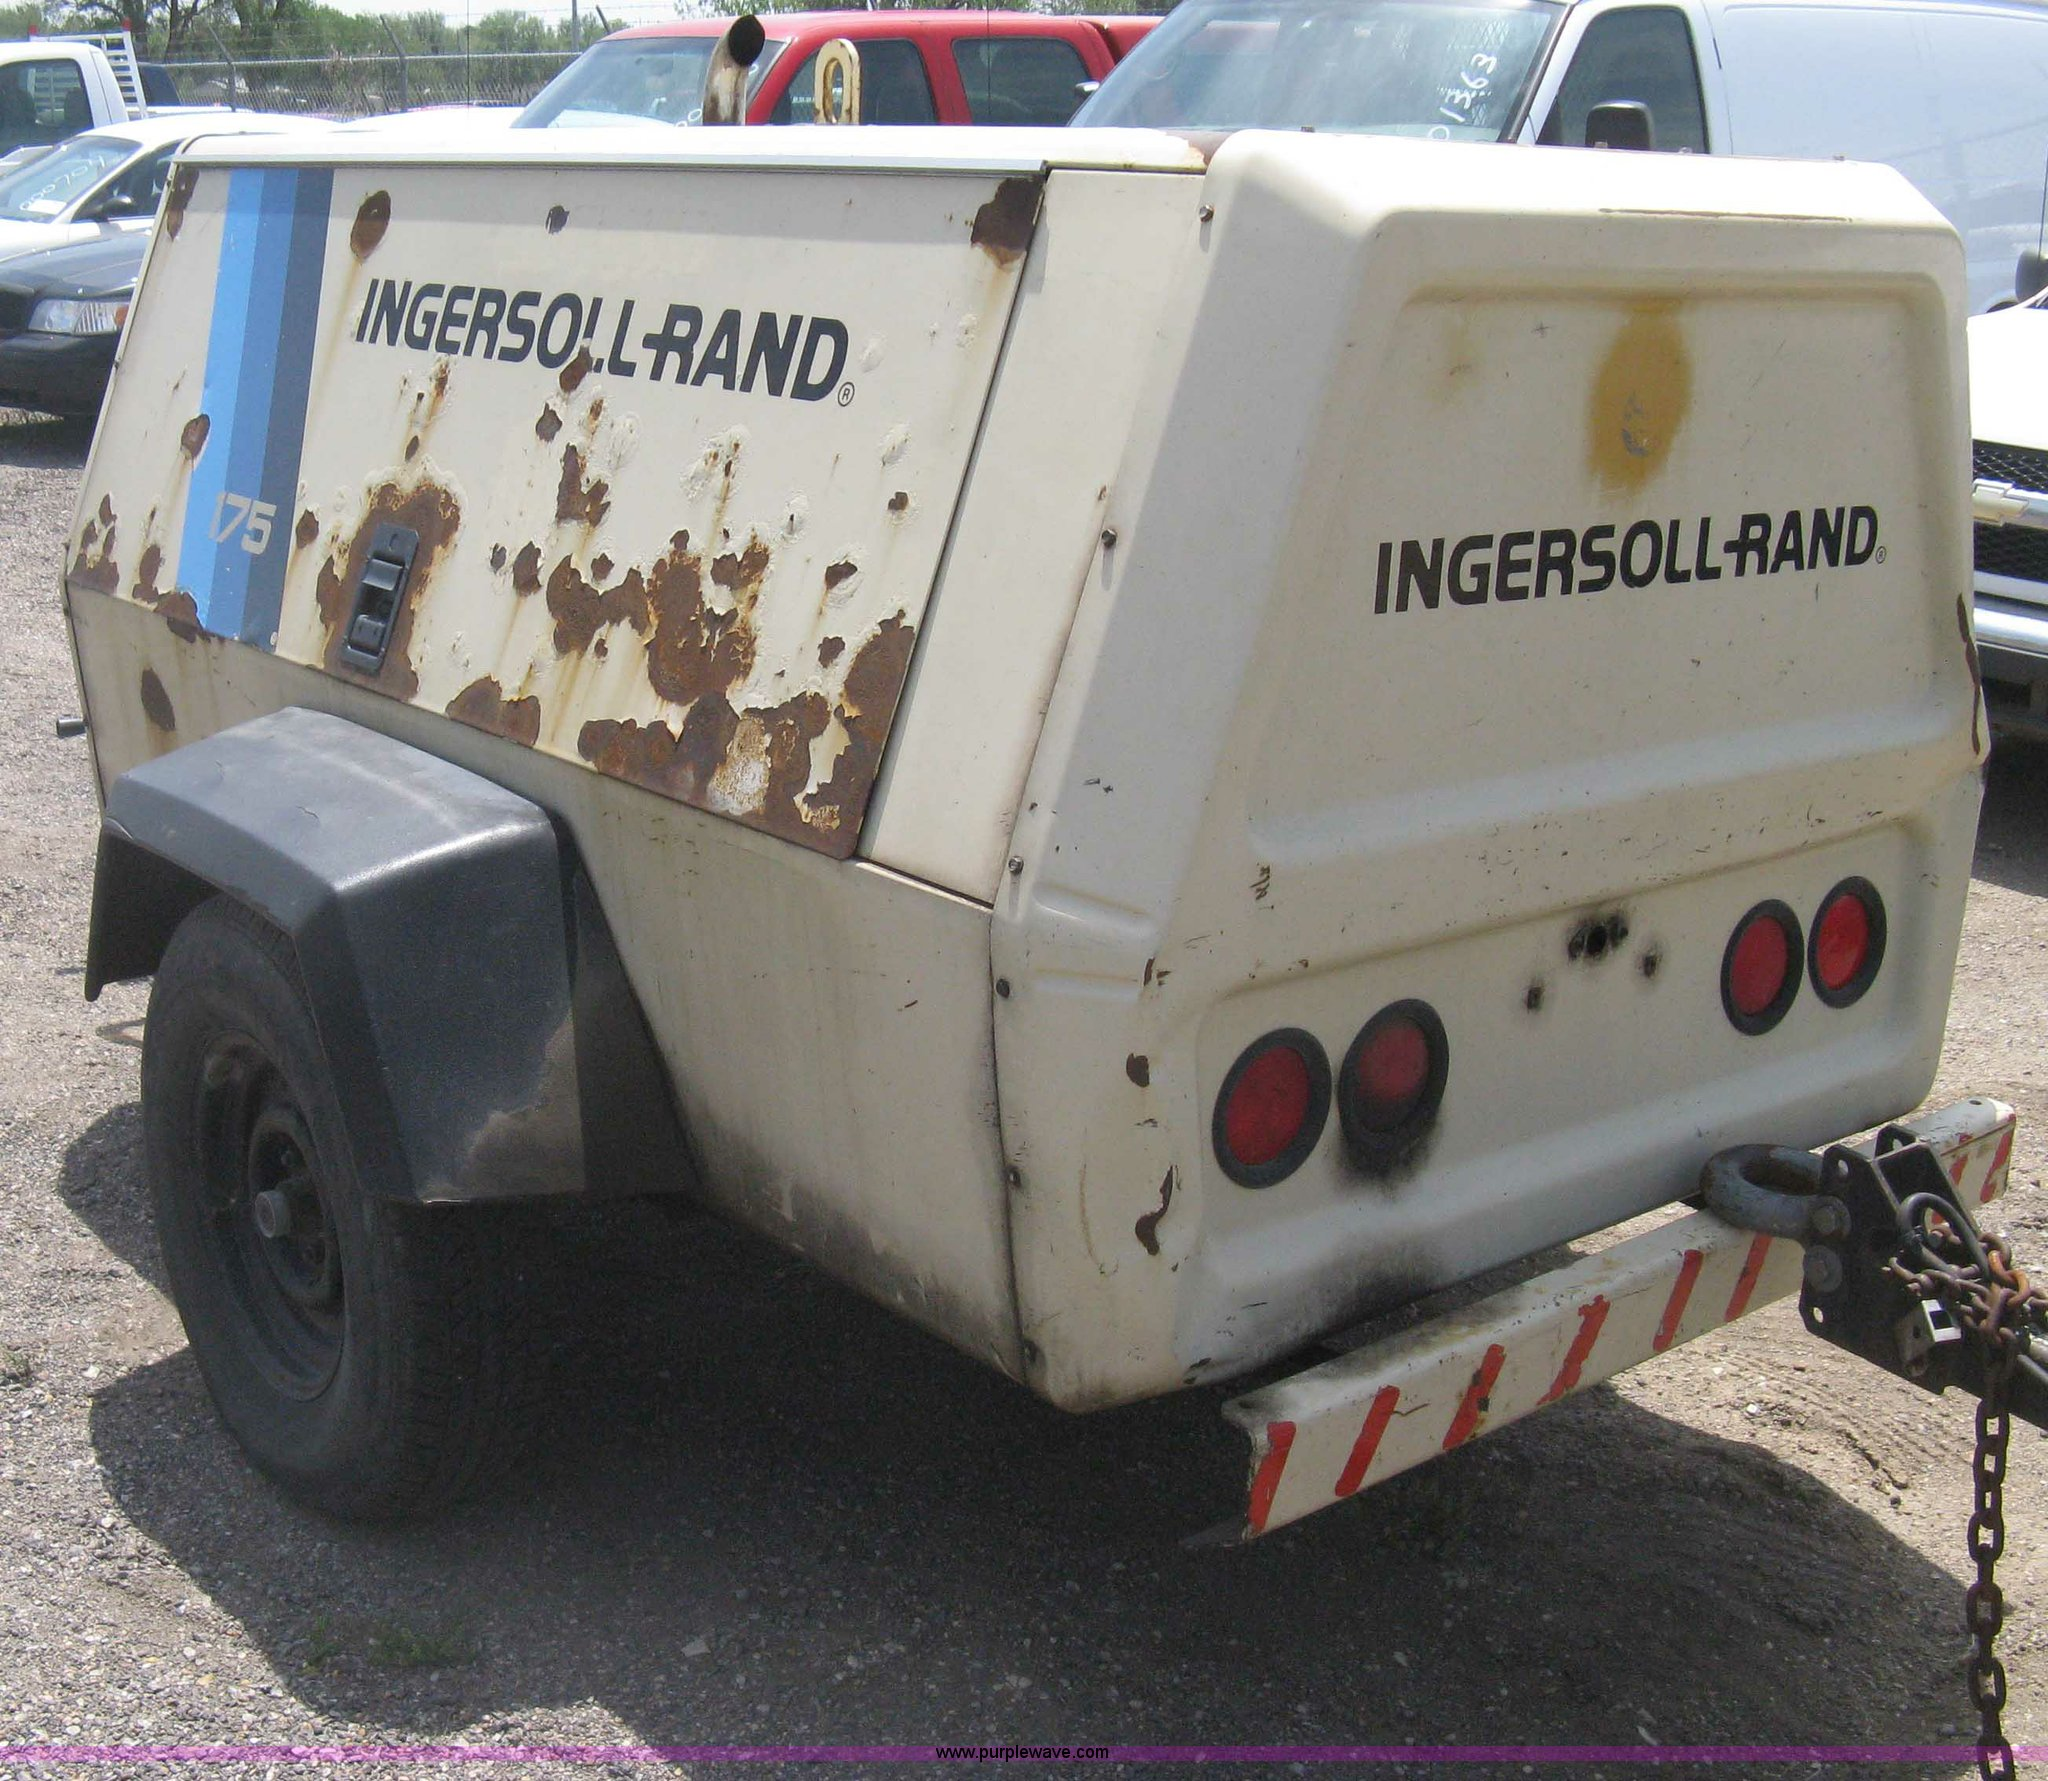 ... Ingersoll Rand P175WJD mobile compressor Full size in new window ...